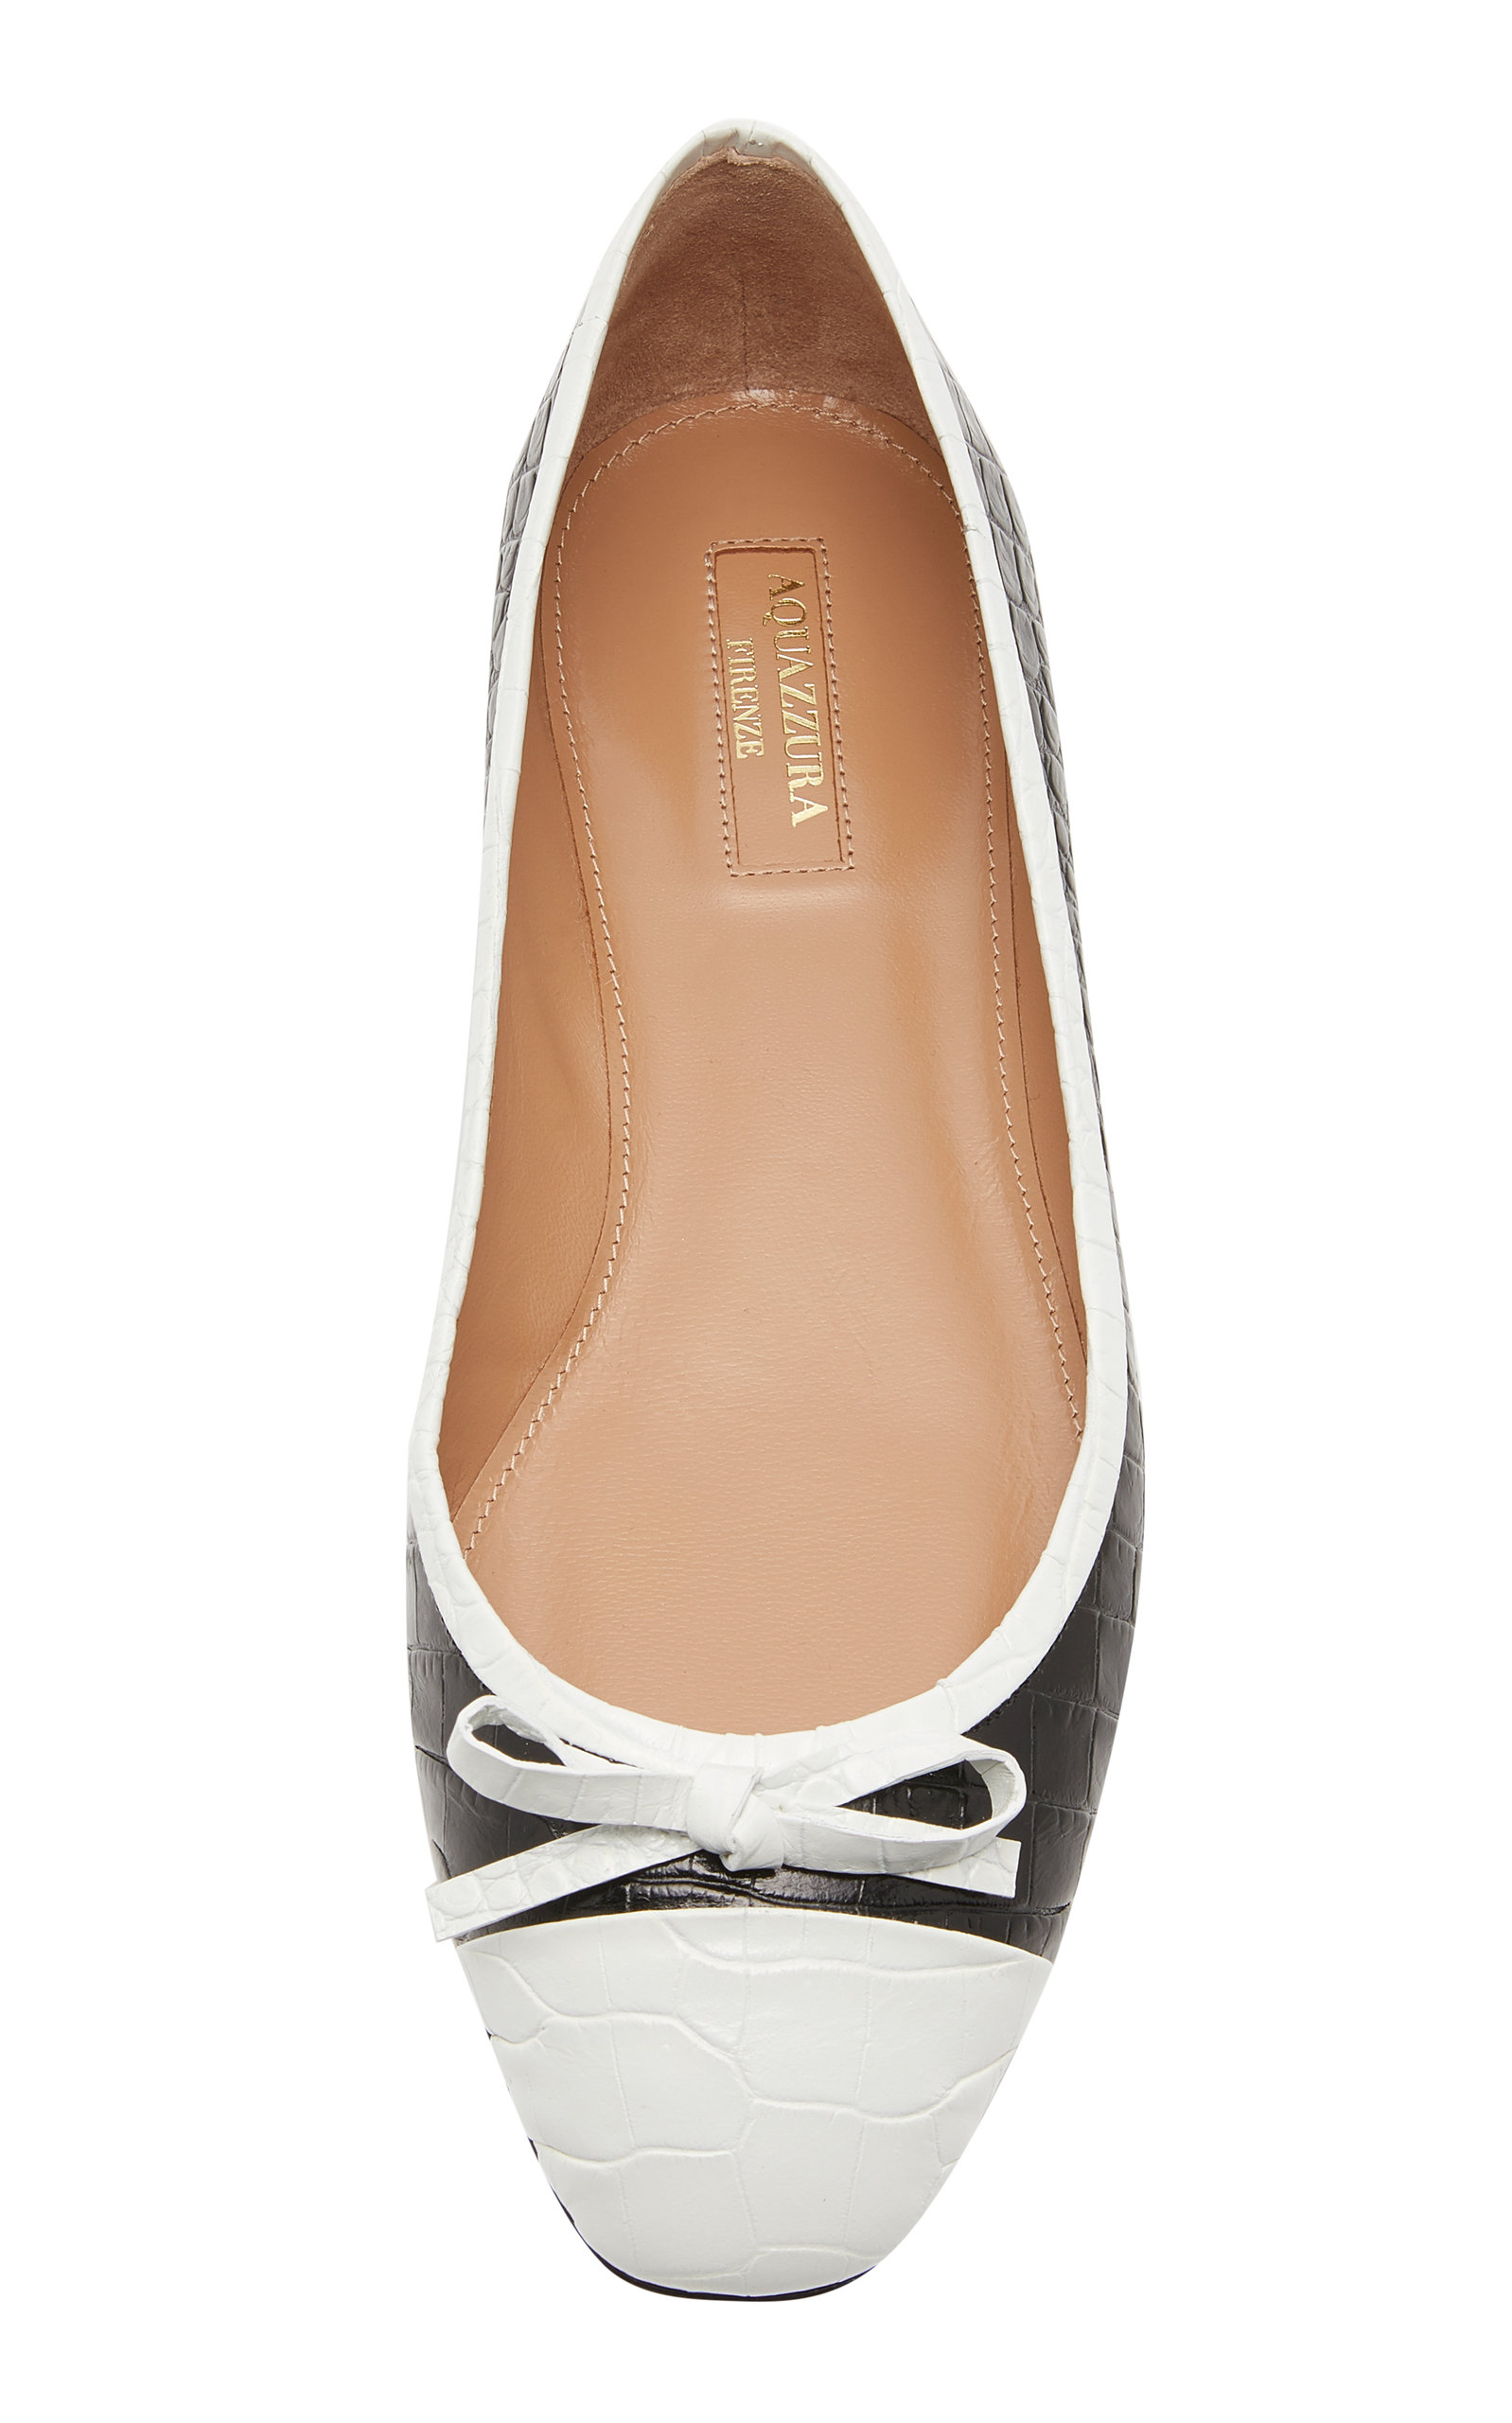 2e2f4f2fc9e29 AquazzuraMoss Two-Tone Croc-Effect Leather Ballet Flats. CLOSE. Loading.  Loading